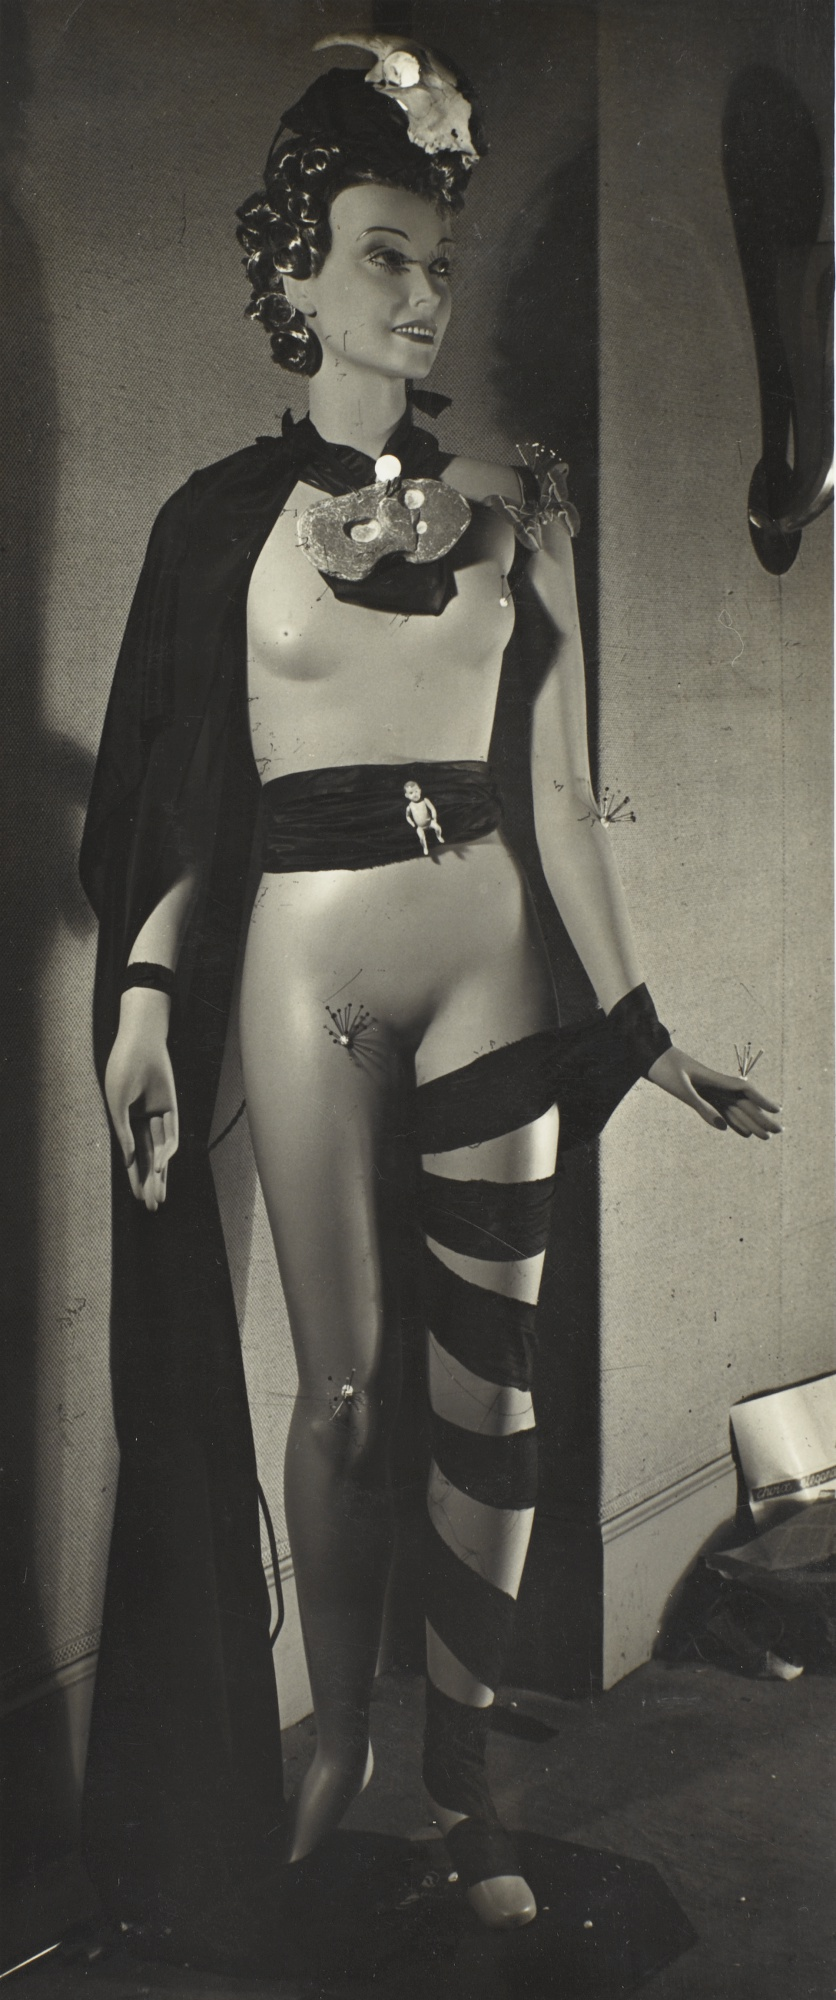 Raoul Ubac-Mannequin De Agustin Espinosa Exposition Internationale Du Surrealisme-1938